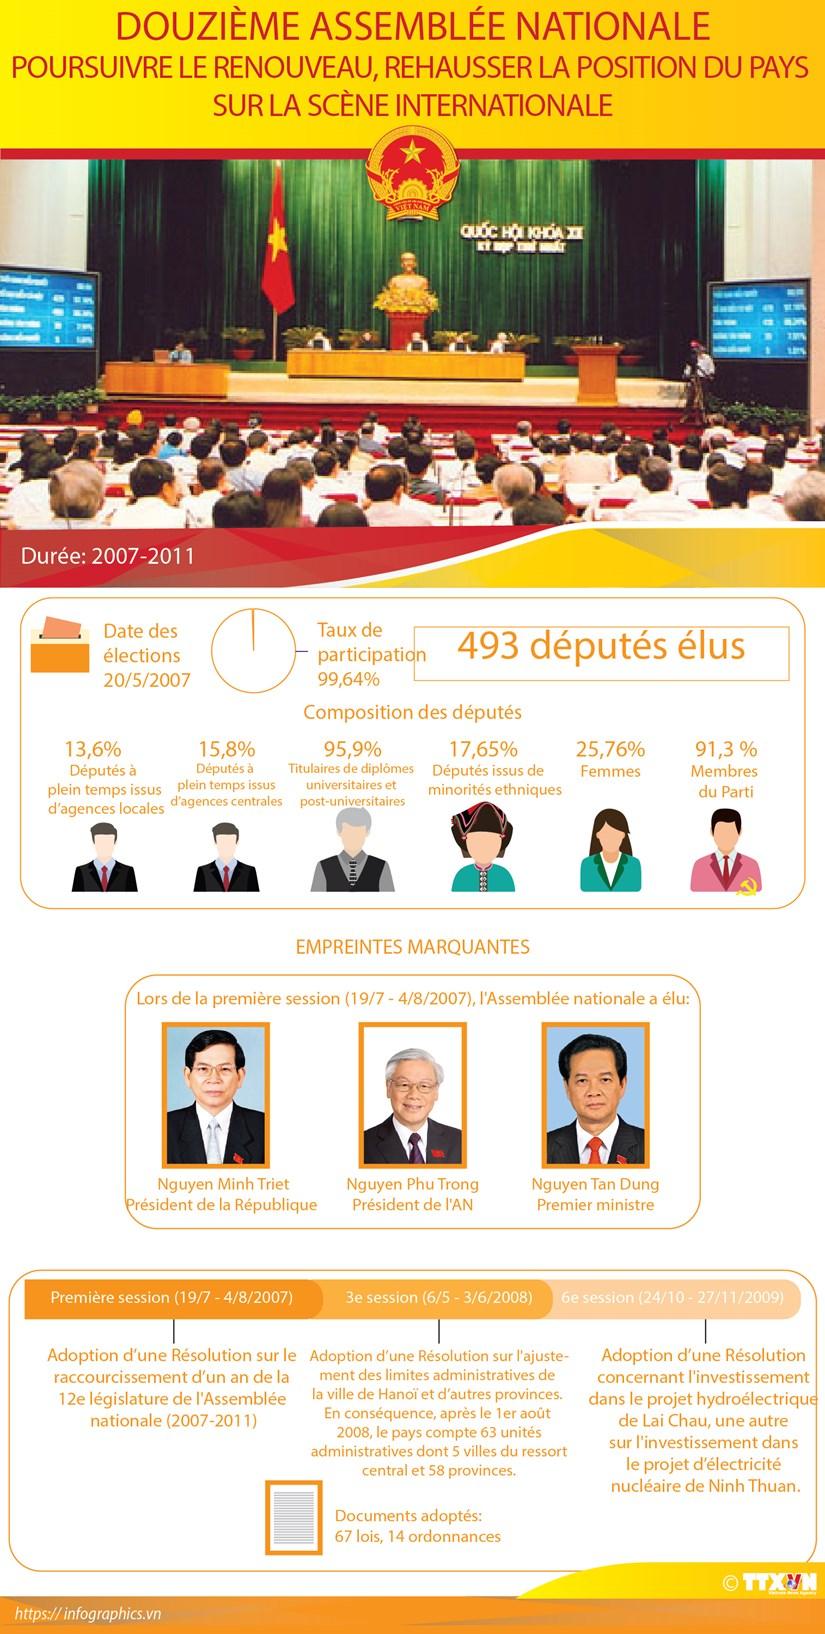 Douzieme Assemblee nationale du Vietnam hinh anh 1